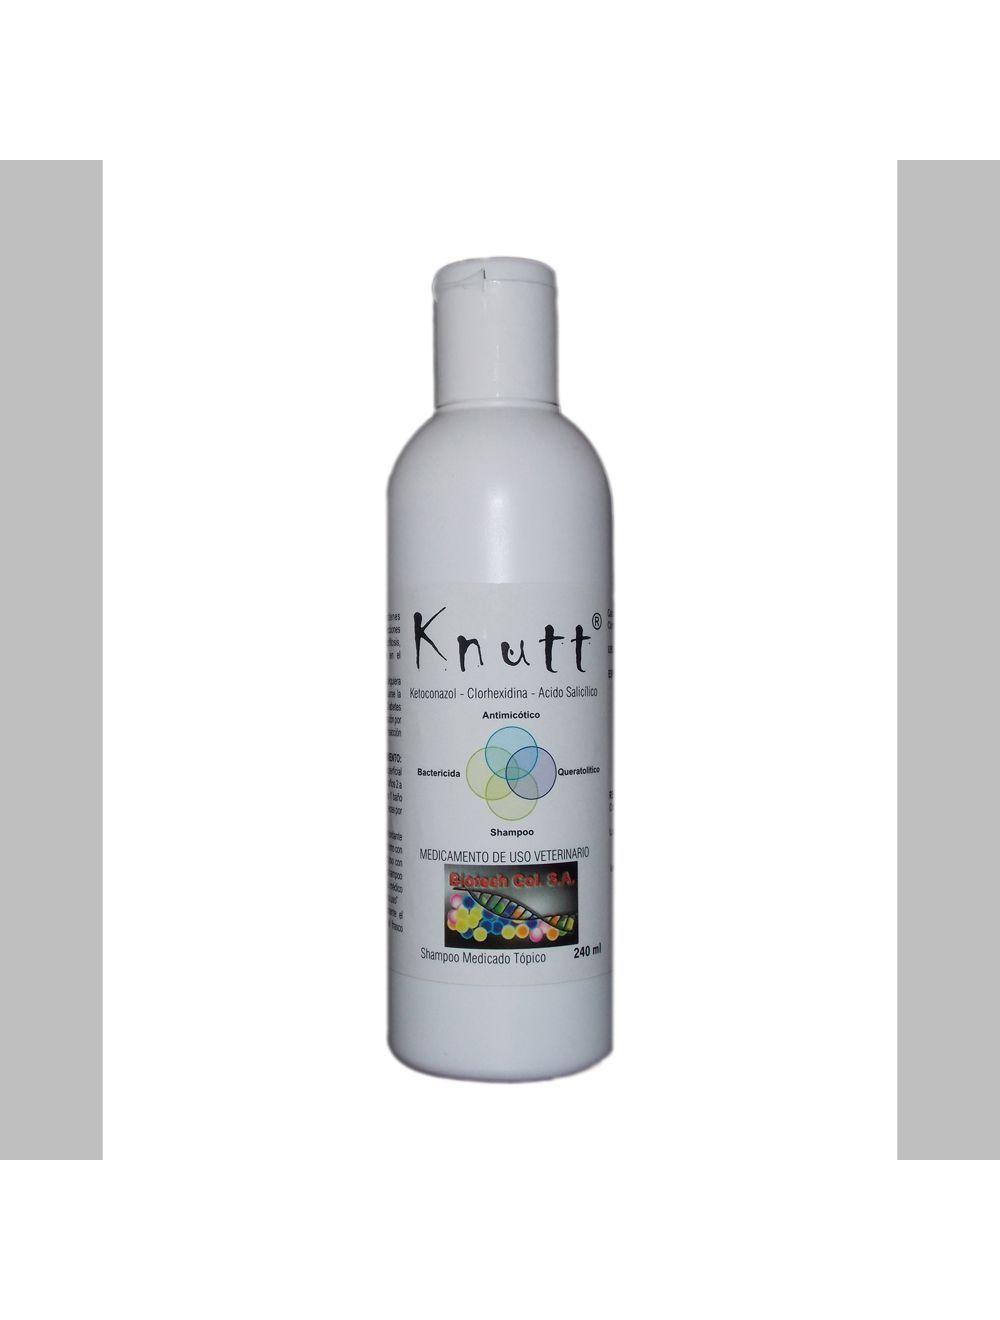 Knutt Shampoo Medicado Tri conjugado 240 Ml